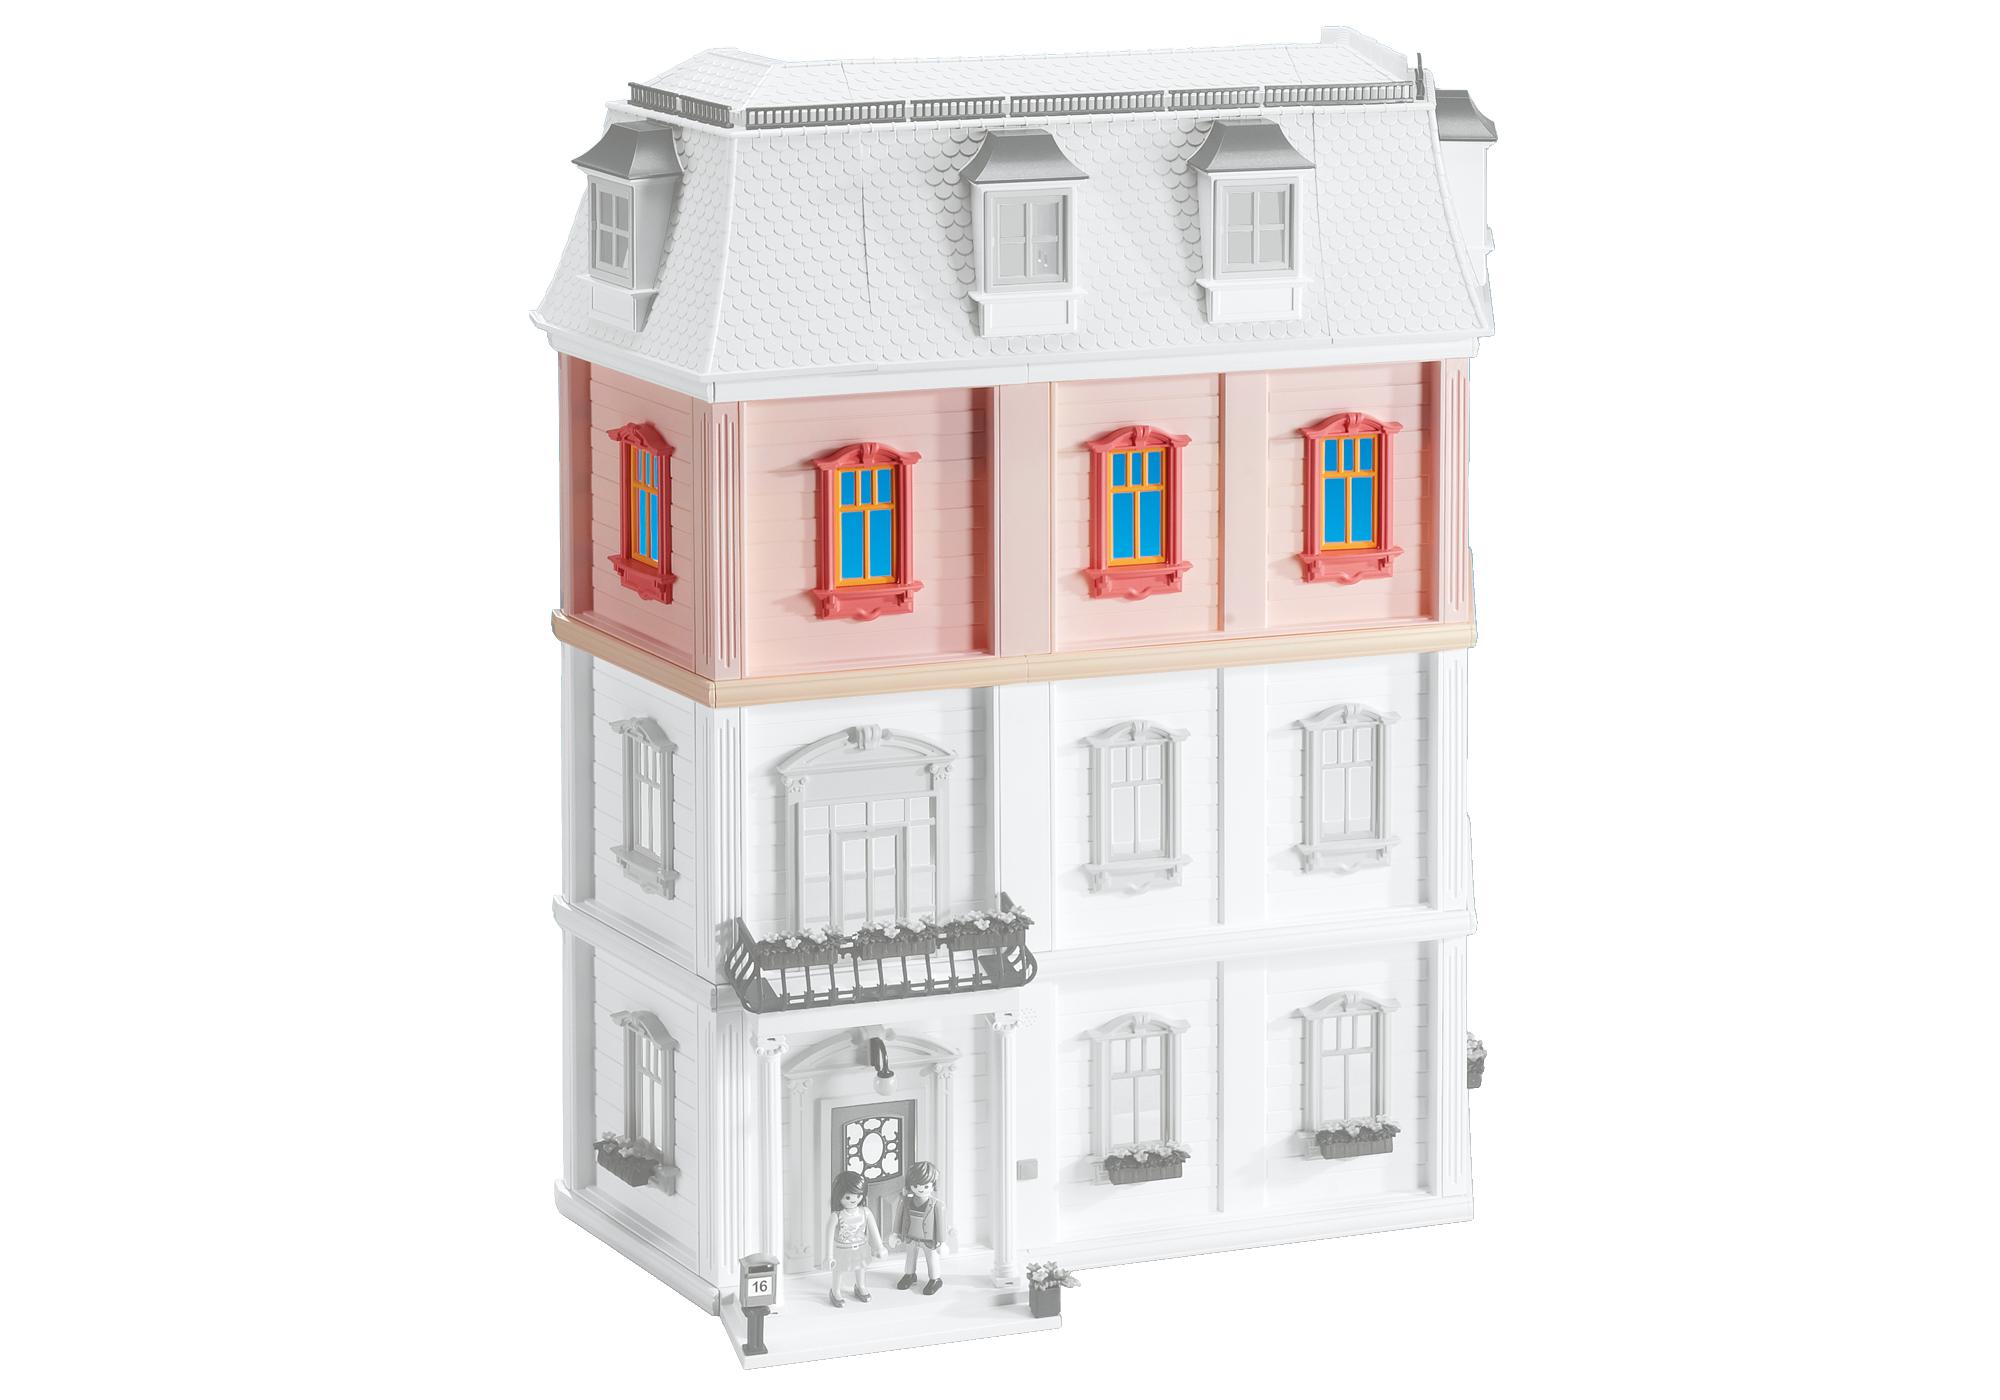 Playmobil Dollhouse Slaapkamer : Uitbreidingsset b voor herenhuis playmobil nederland